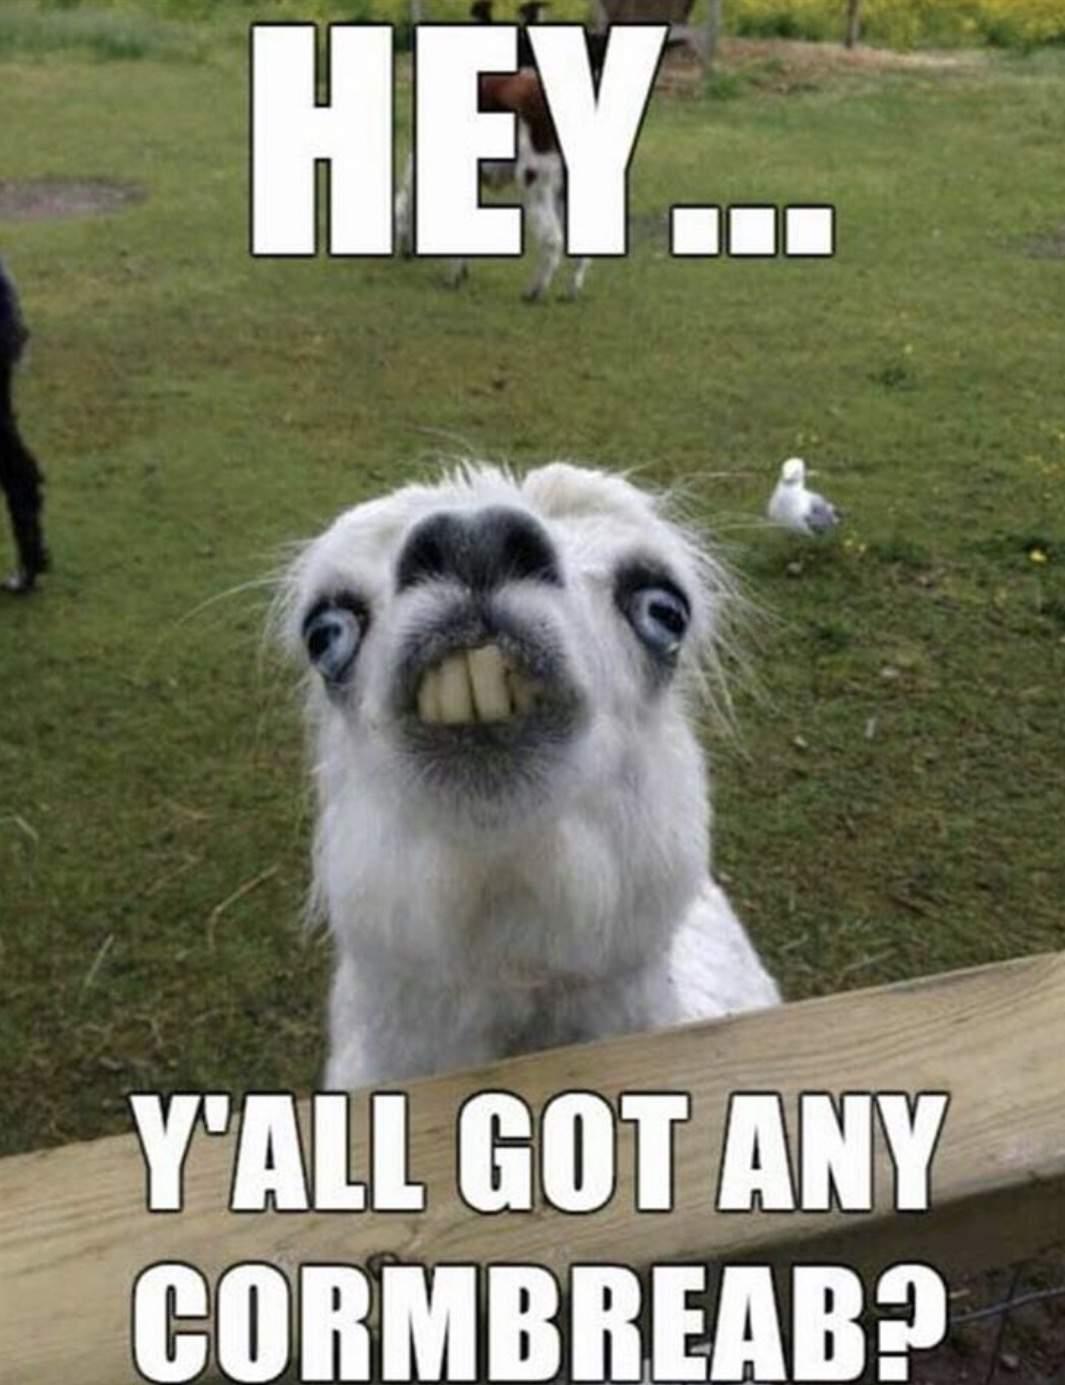 Funny animal yall got any cornbreab